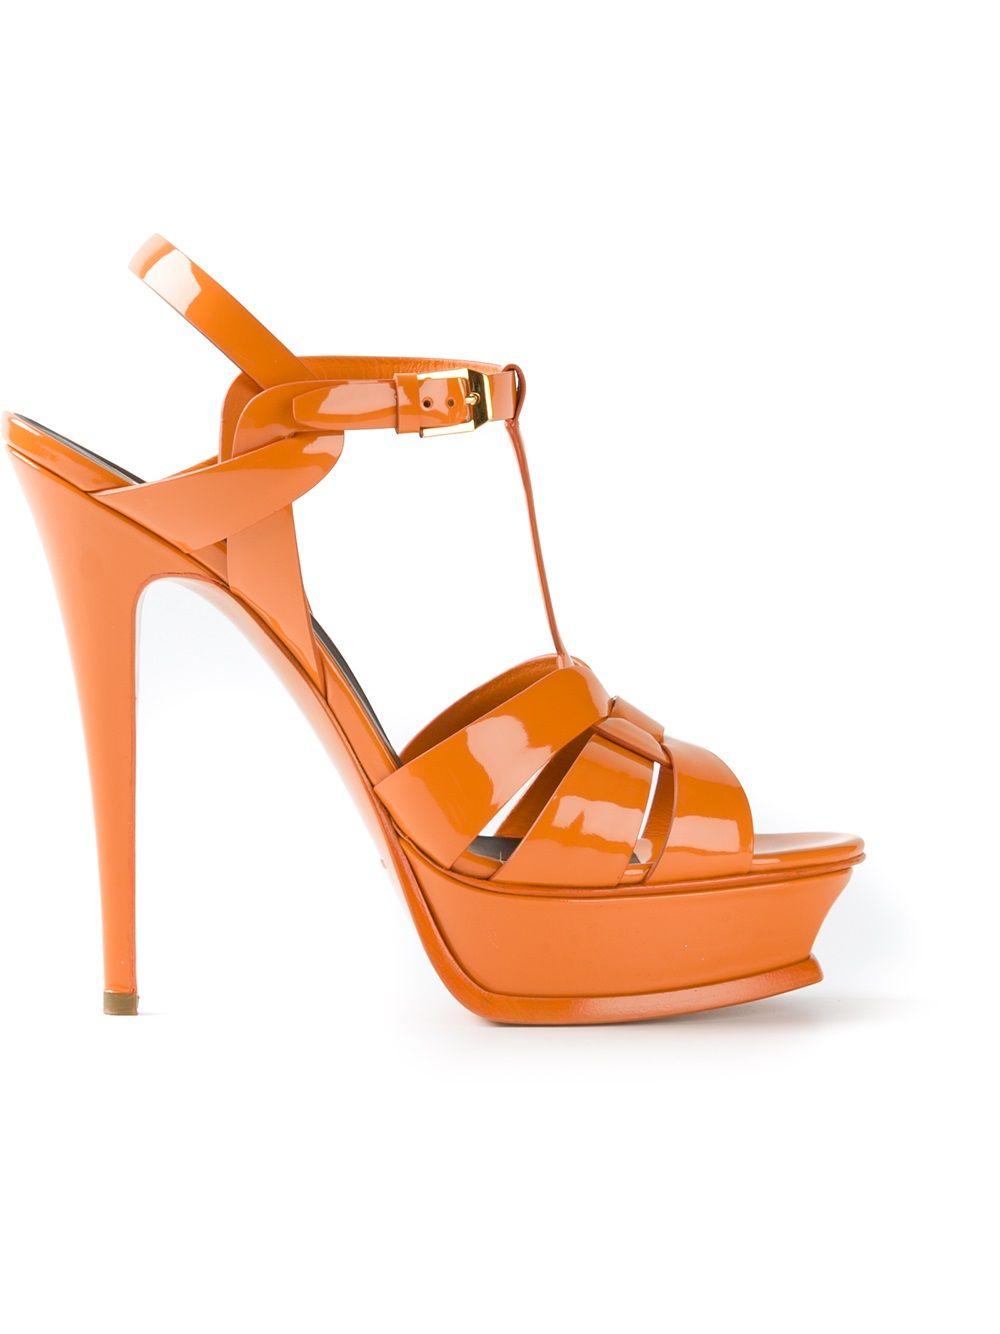 6f453ca23b4d Mandarine orange patent calf leather  Classic Tribute 105  sandal from  Saint Laurent featuring an open toe